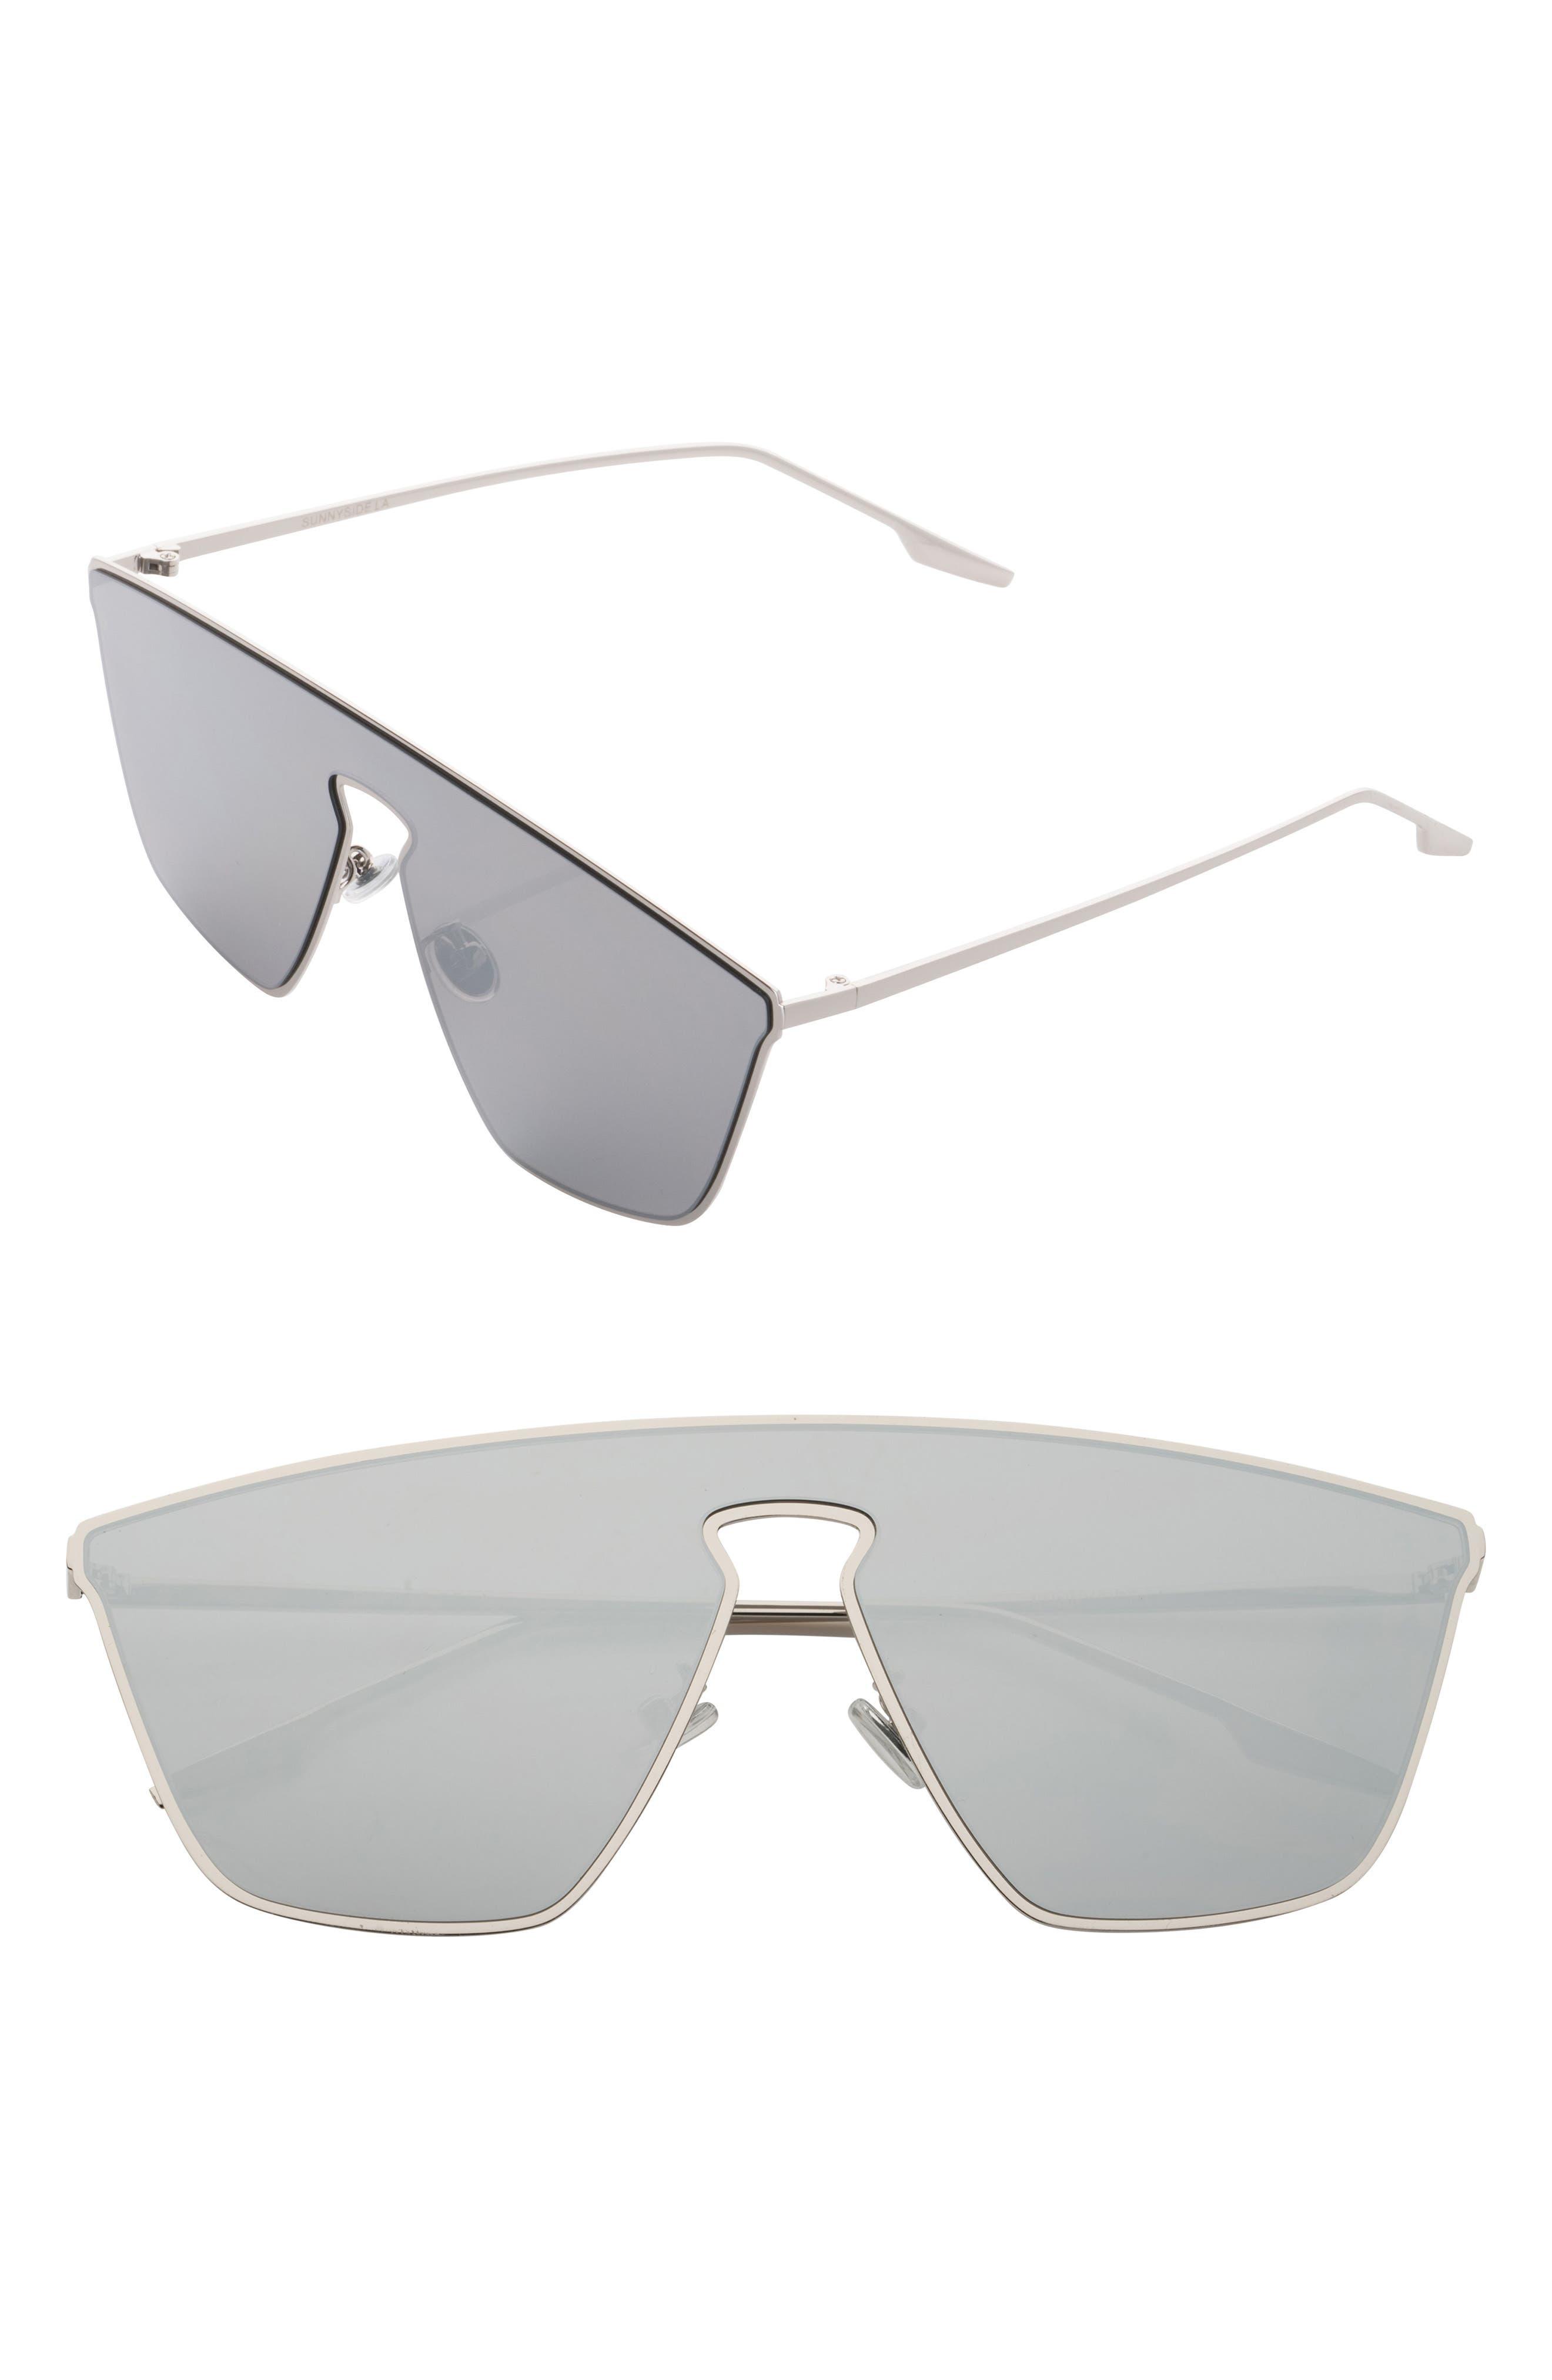 65mm Shield Sunglasses,                             Main thumbnail 1, color,                             040